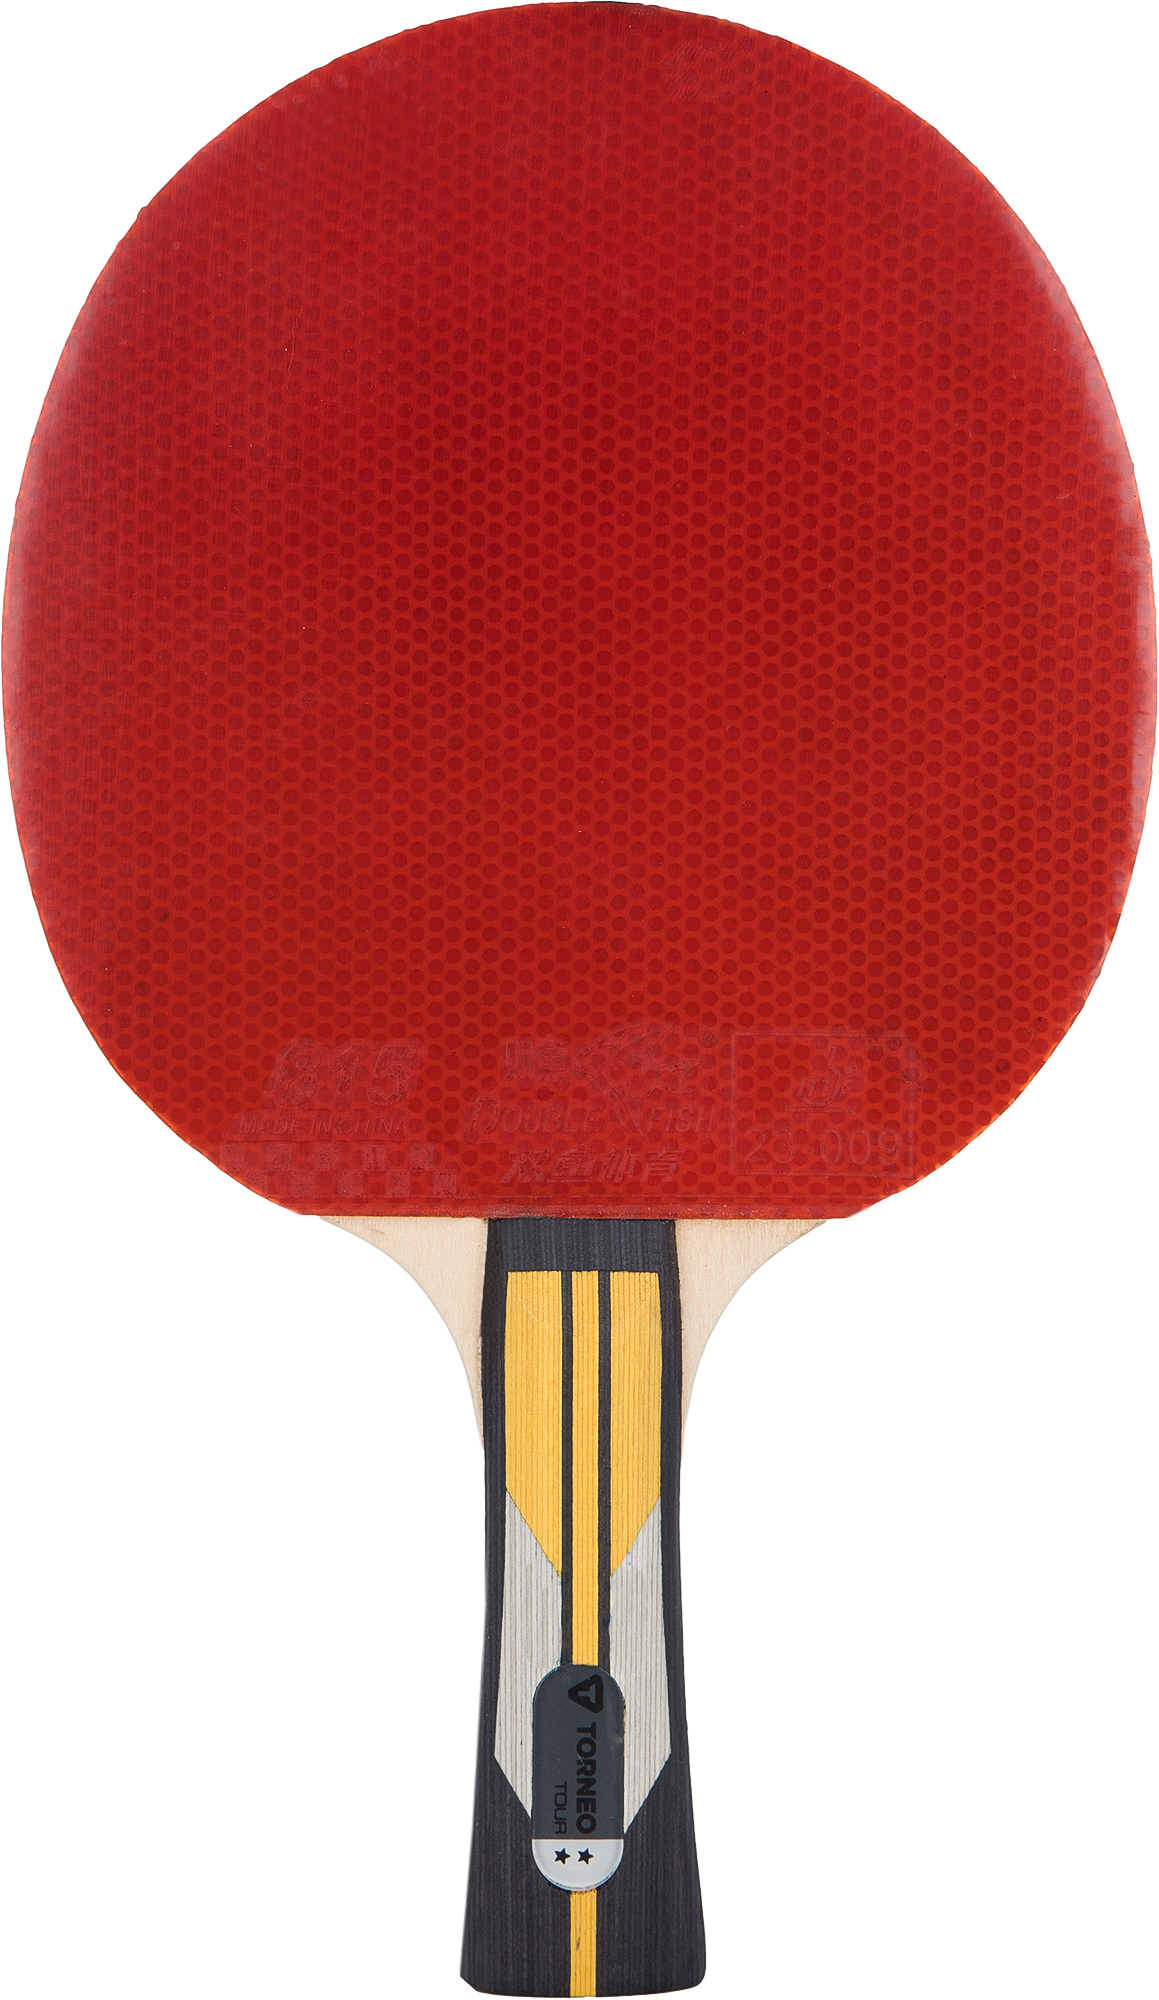 Torneo Ракетка для настольного тенниса Torneo Tour stiga ракетка н т 2 tour